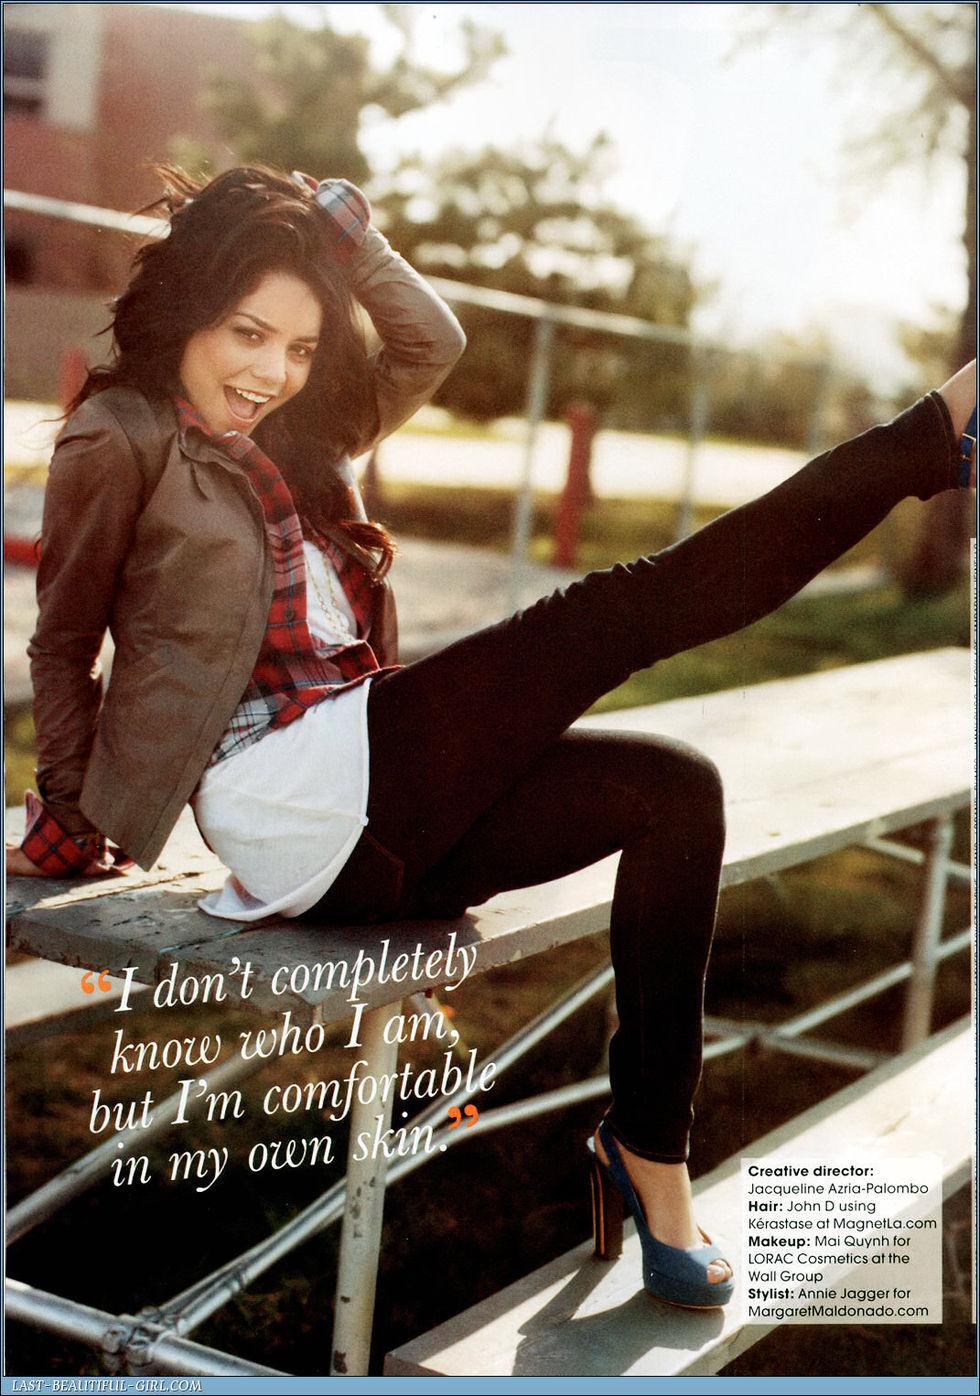 vanessa-hudgens-cosmo-girl-magazine-august-2008-02